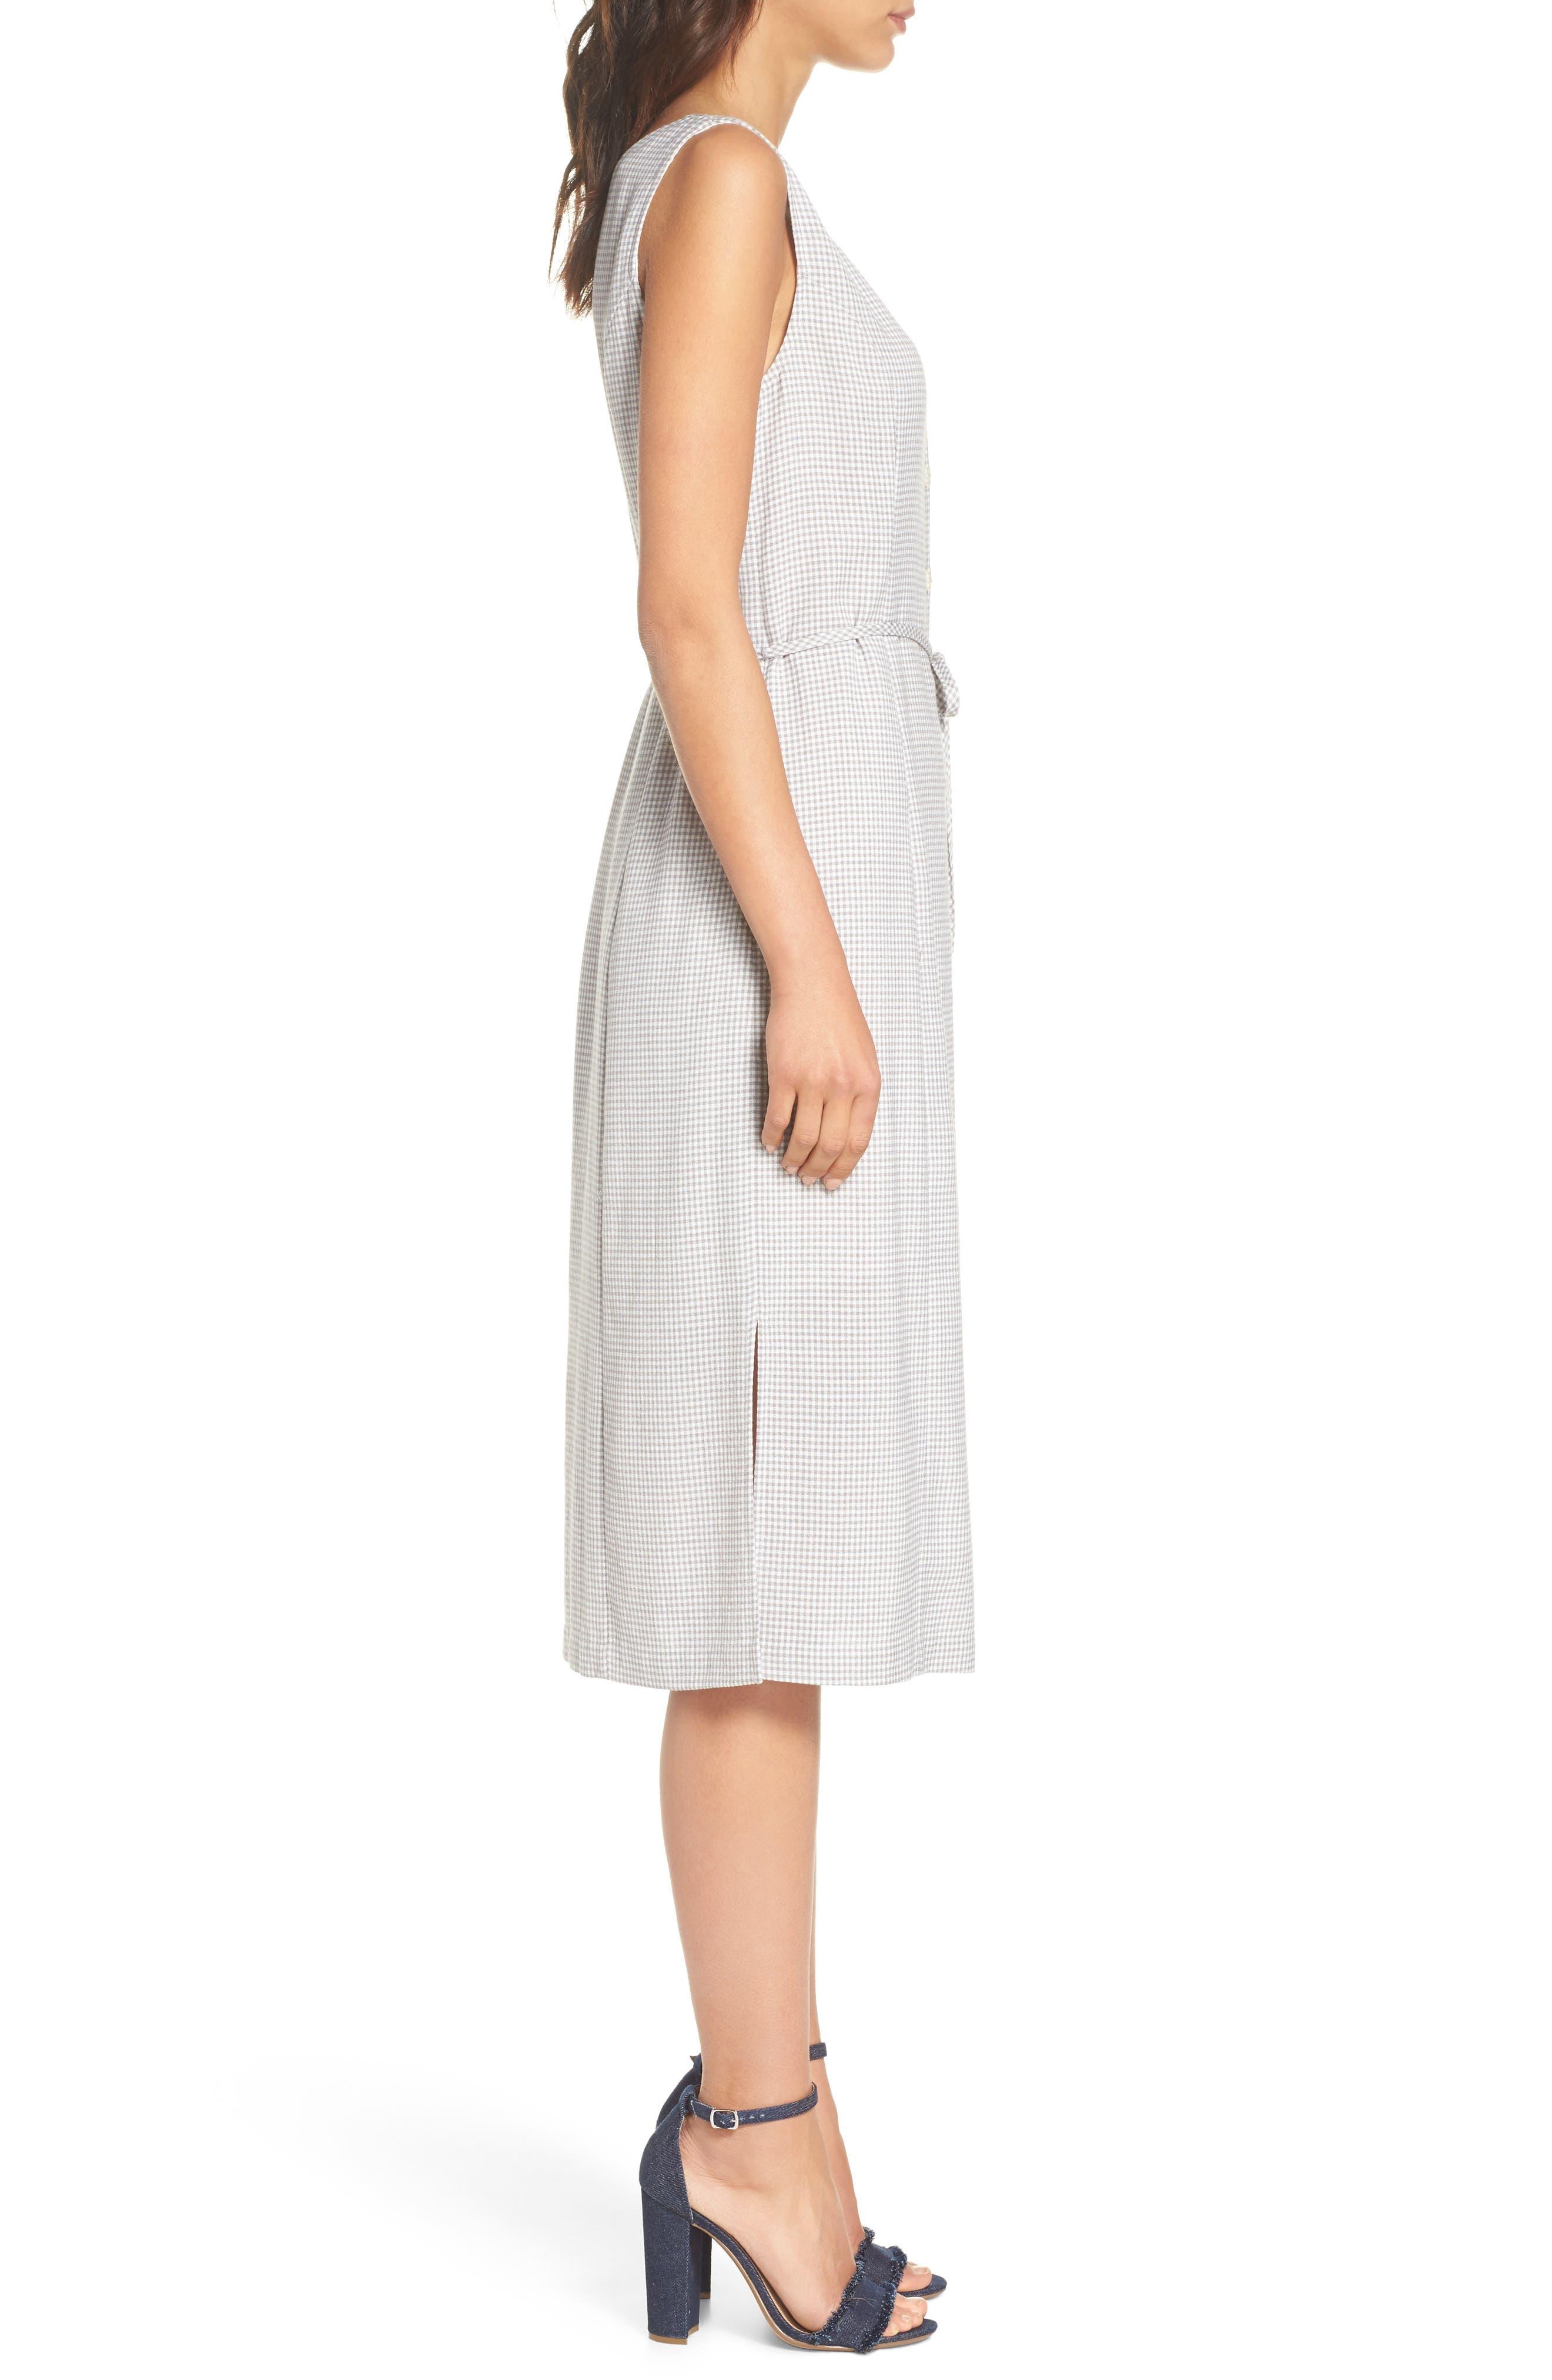 Gingham Midi Dress,                             Alternate thumbnail 3, color,                             Grey/ White